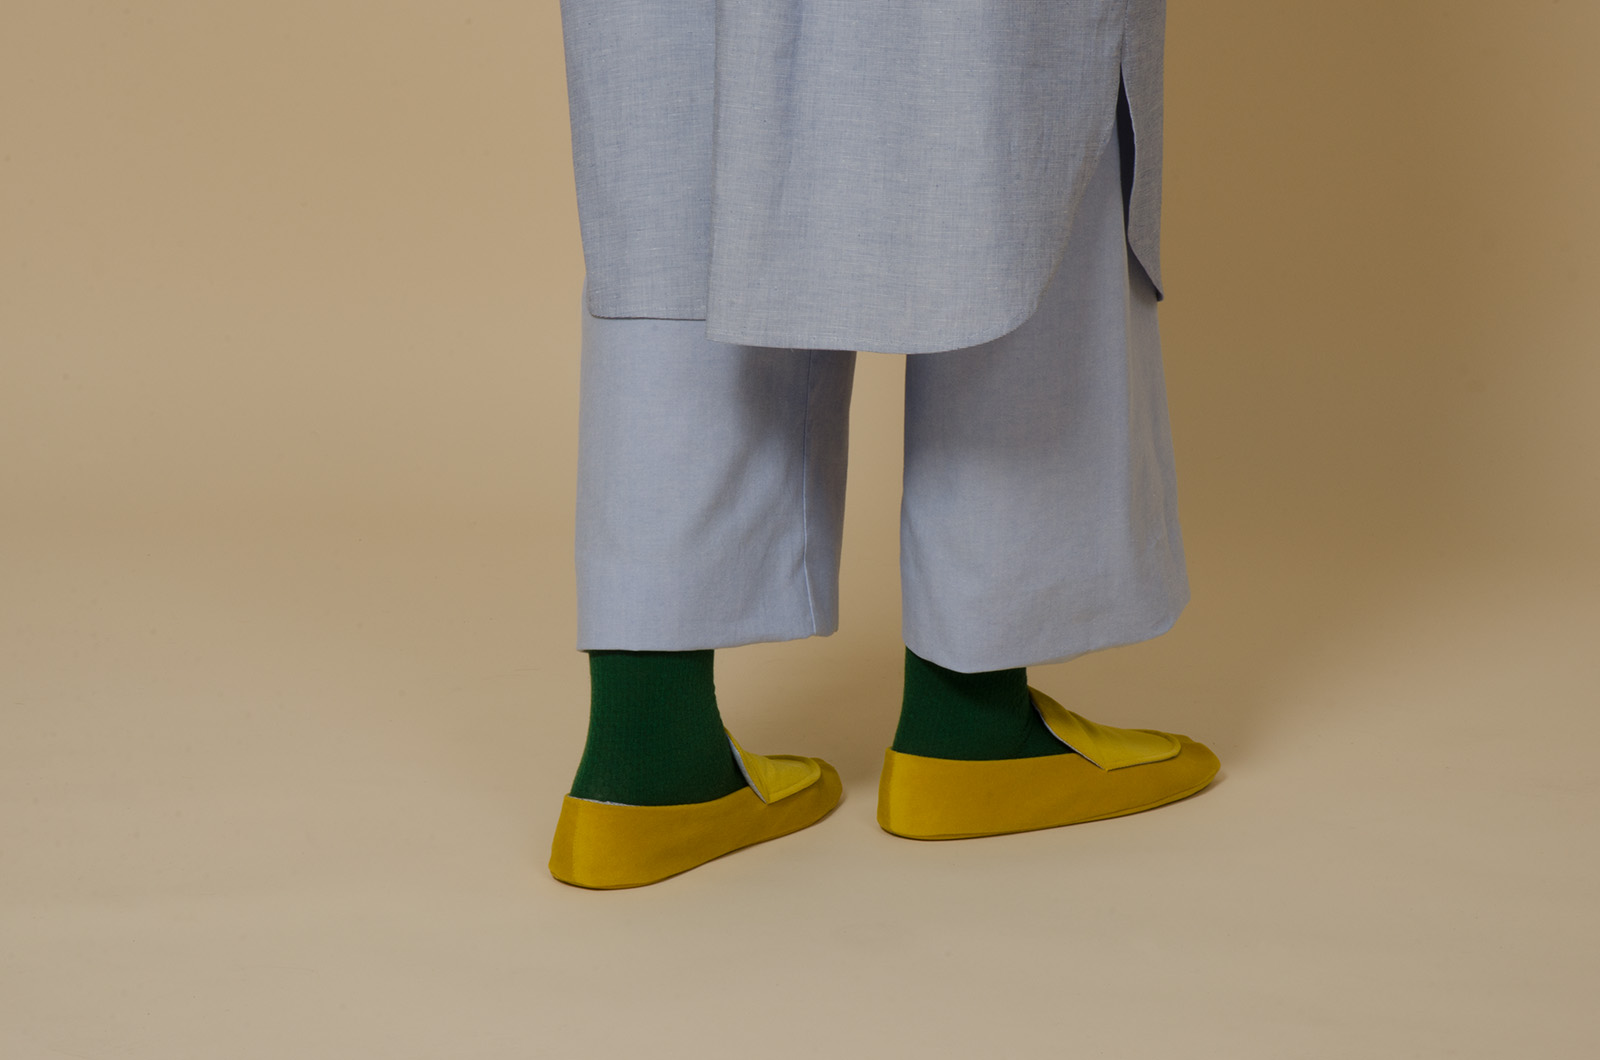 meinwerk diy schnittmuster & anleitung haus slipper, hausschuhe diy, pantoffel nähen, haus schuhe schnittmuster, oversized shirtdress, easy culotte, nähanleitung, hemdkleid nähen, hemdkleid schnitt, bluse nähen, blusen schnittmuster, weites hemdkleid selber nähen, weite bluse, weites blusenkleid, oversized bluse, tunika schnitt, diy design, hemdstoff, blusenstoff, handmade shirt, diy berlin, minimalistisch, minimalism, puristisch, slow fashion, nachhaltig, skandinavisch, pyjamahose, marlenehose, culottes, baumwollhose, hosenschnitt damen, jogahose nähen,